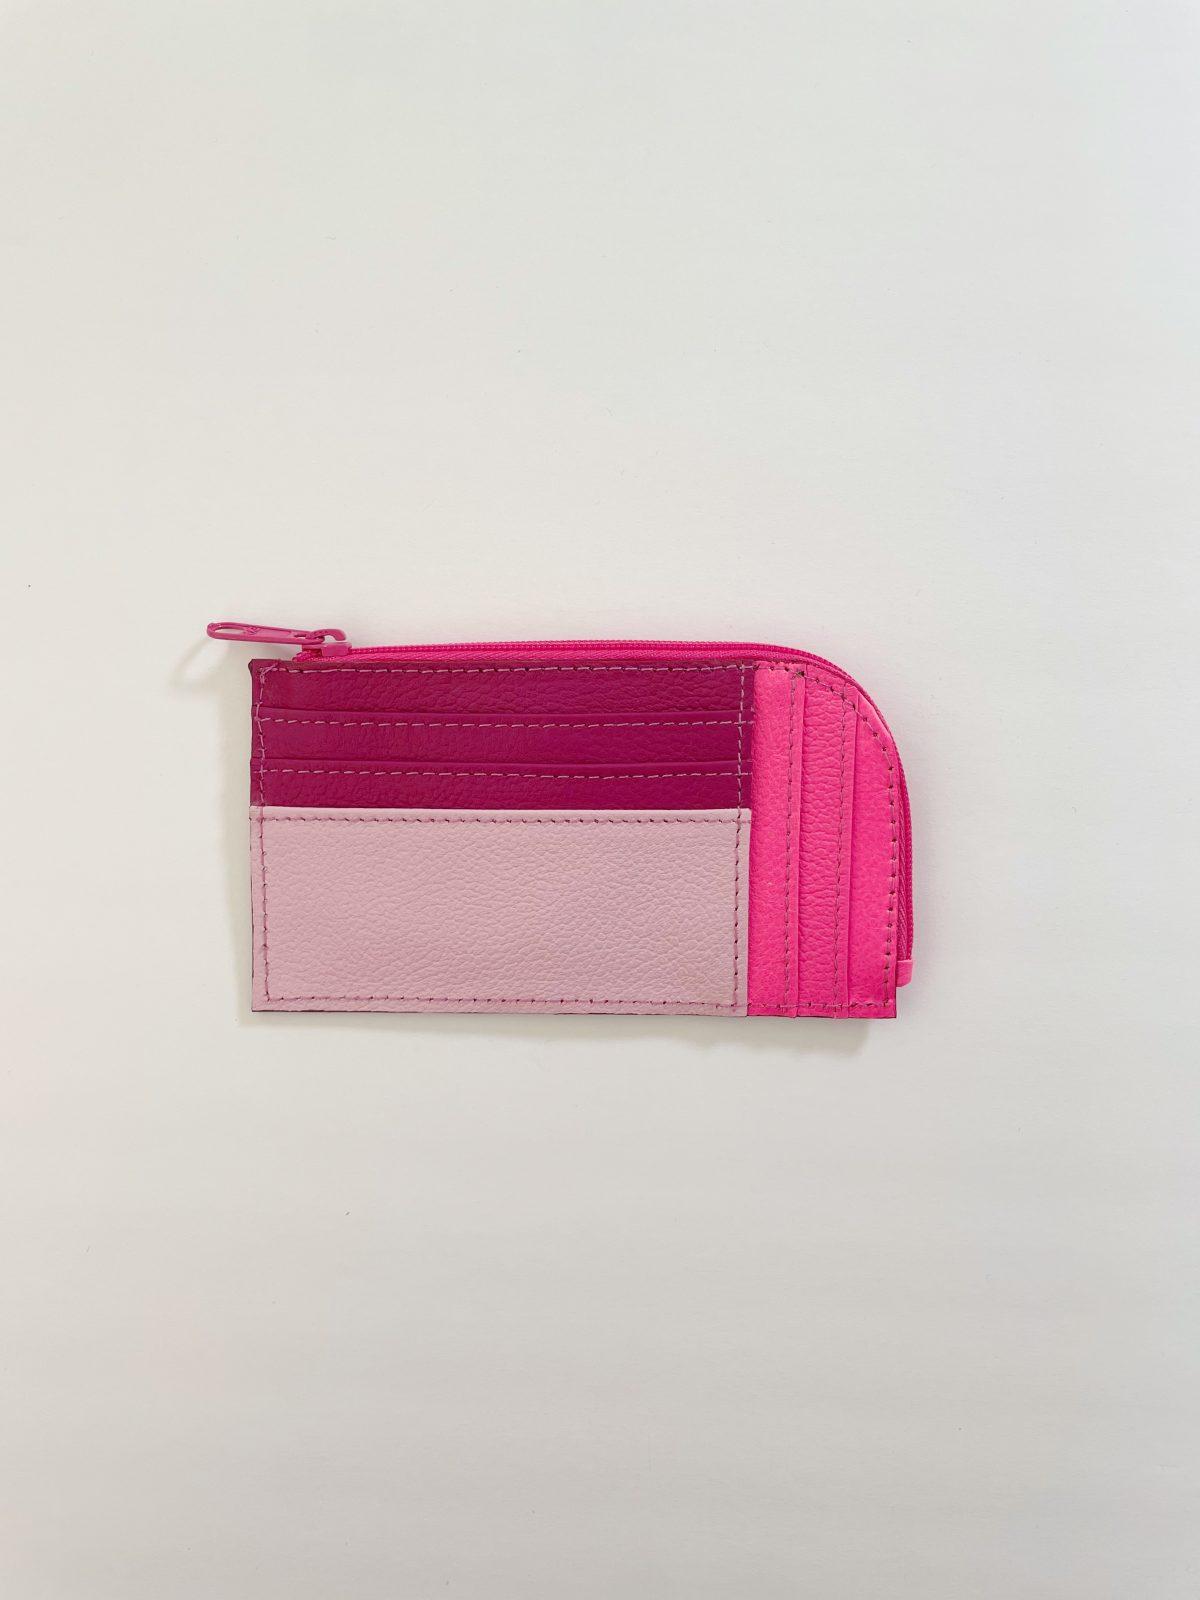 Zip_Card_holder_women_accessories_pink_fuchsia_01